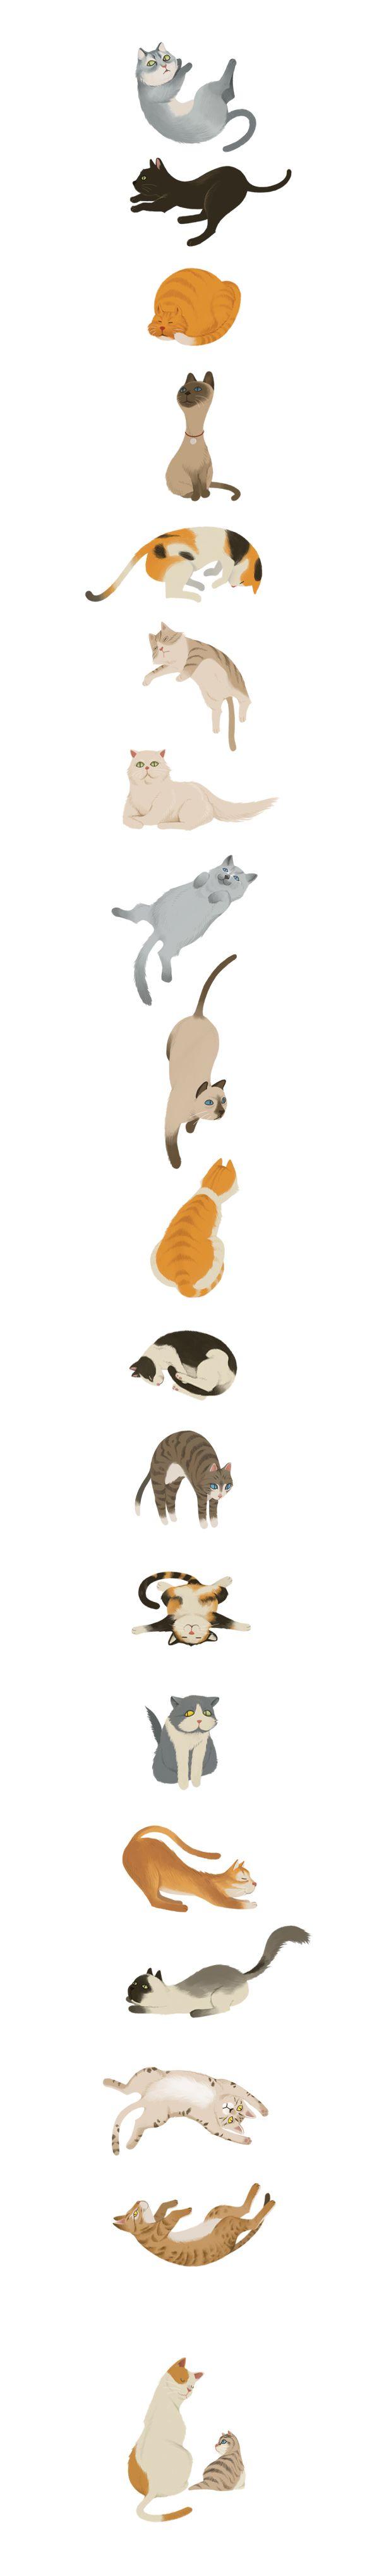 Cats on Illustration Served